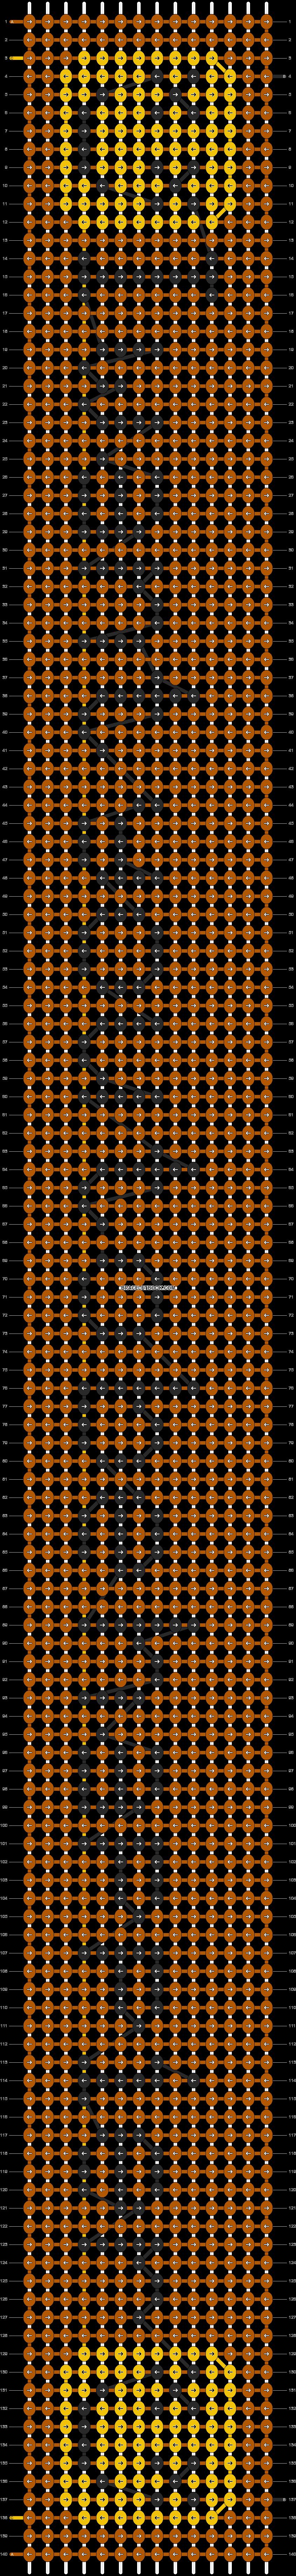 Alpha pattern #104522 pattern